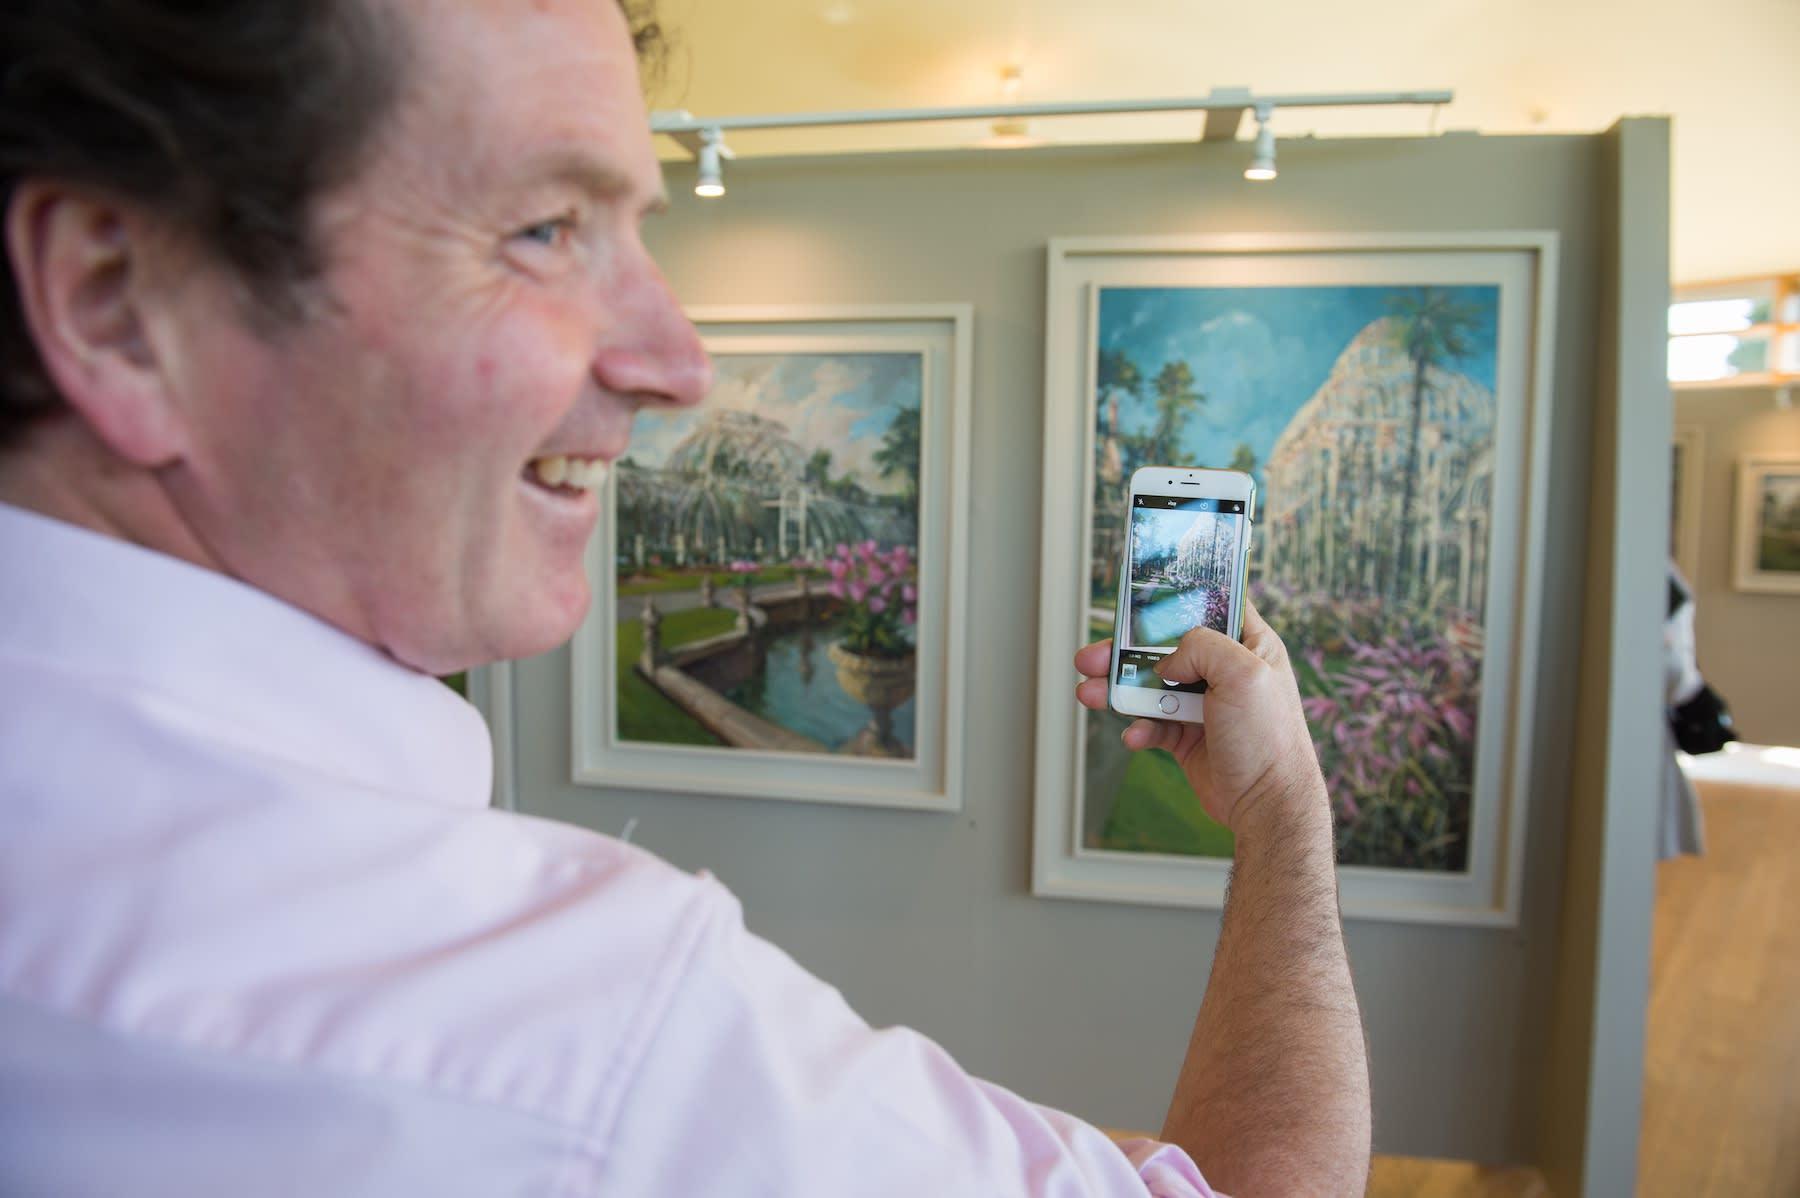 21 JUNE 2018 NATIONAL BOTANIC GARDENS OF IRELAND, DUBLIN Diarmuid Gavin launching Inside Outside & Beyond exhibition photo: Barry Cronin